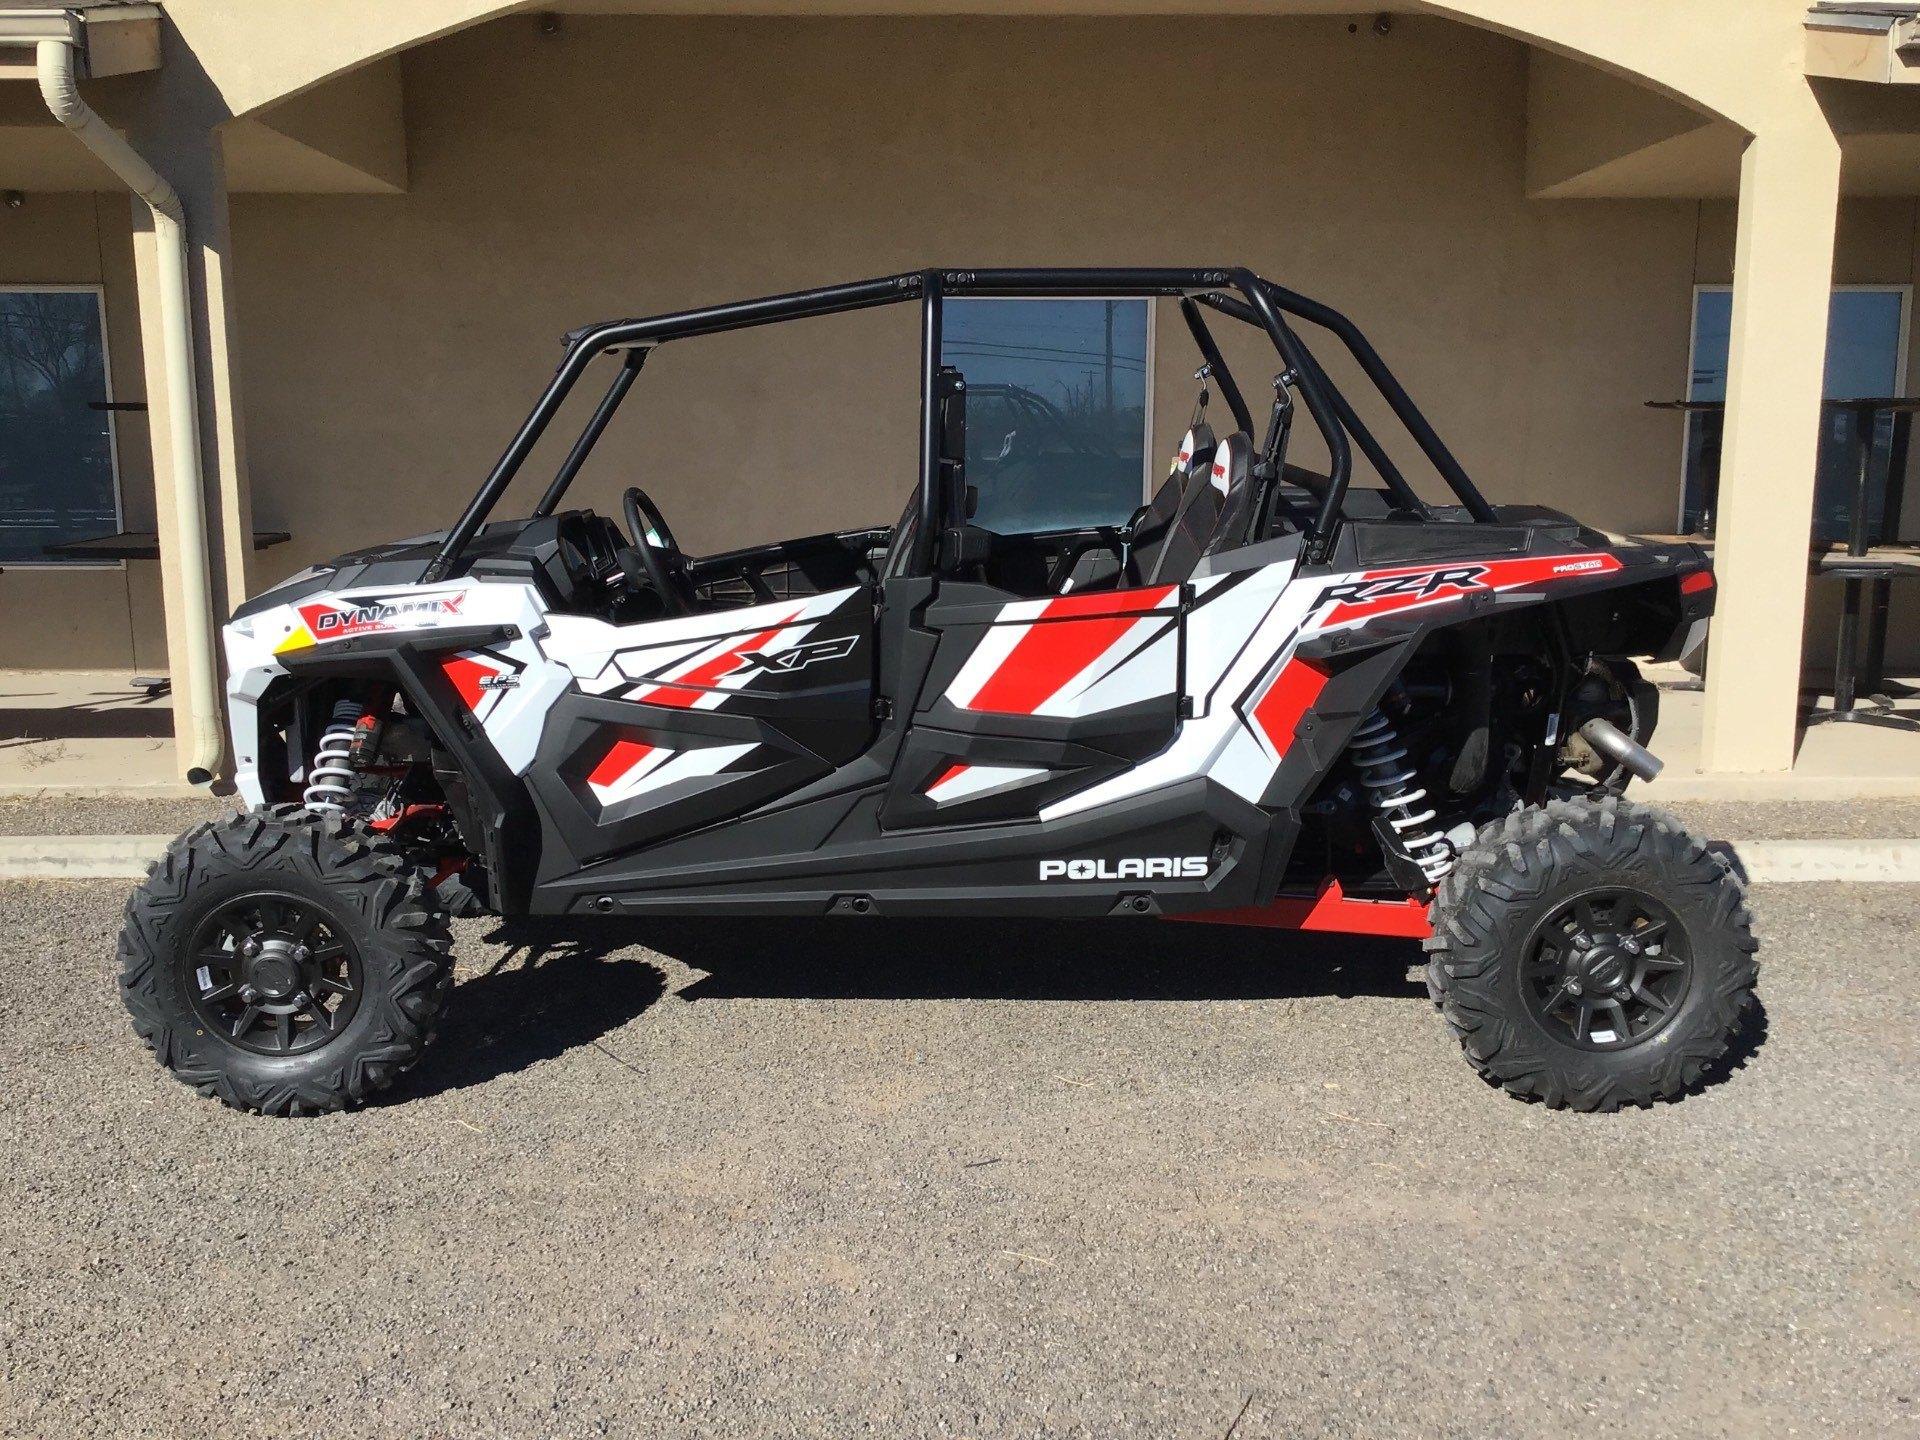 Polaris Rzr 1000 4 Seater >> 2019 Polaris Rzr Xp 4 1000 Dynamix In Roswell New Mexico